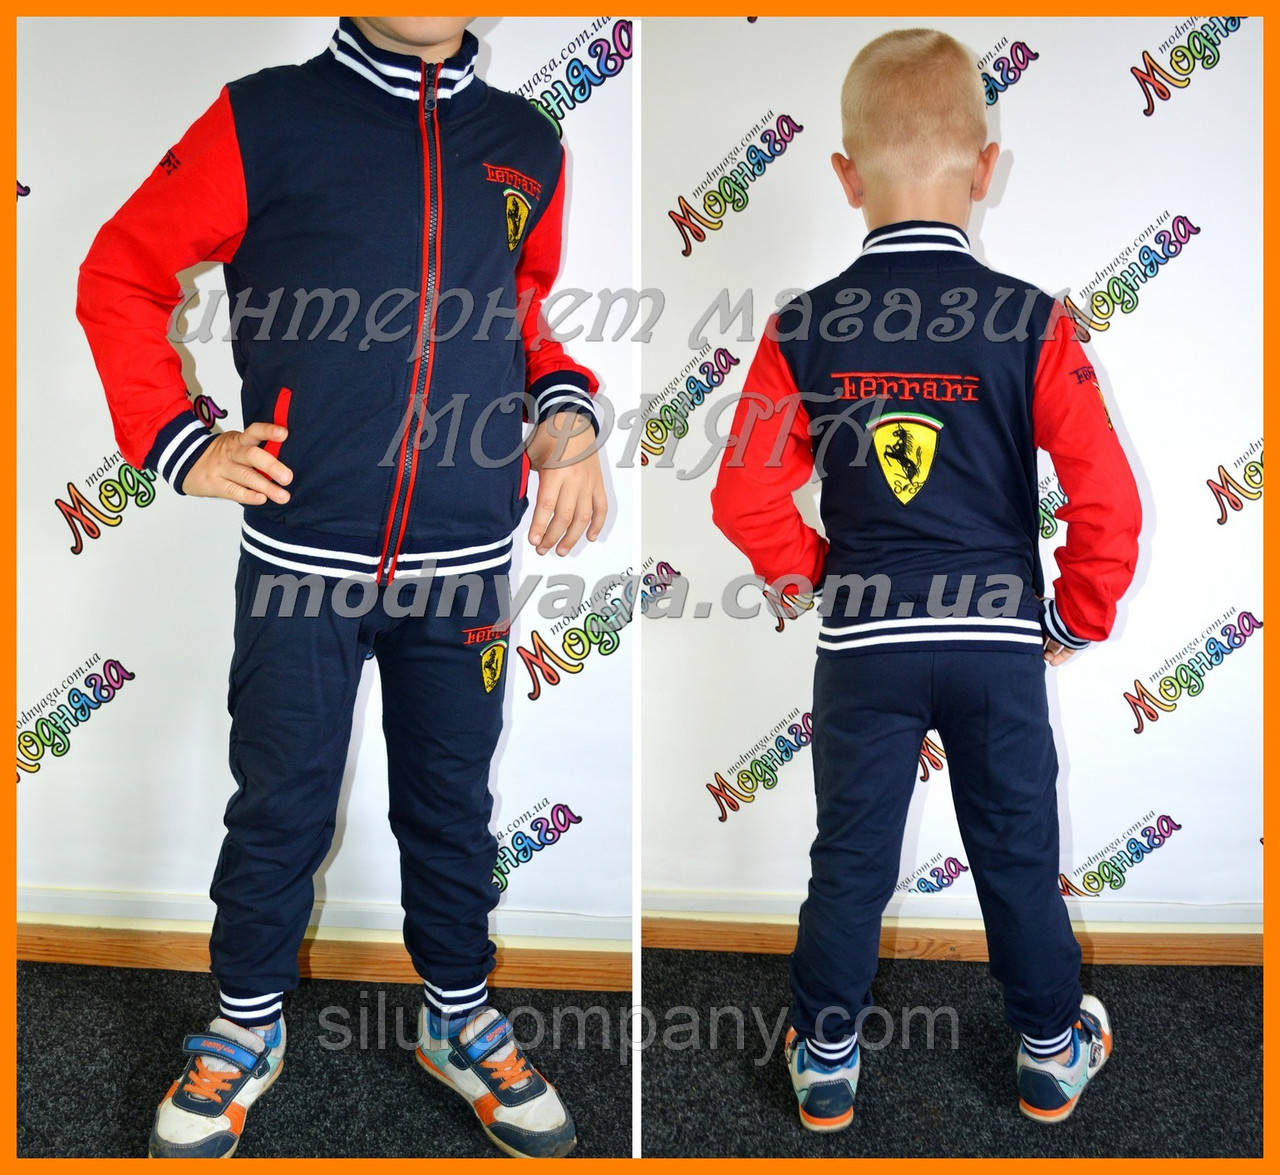 6bf1a68a Детский спортивный костюм Феррари Таиланд | Ferrari - Интернет магазин